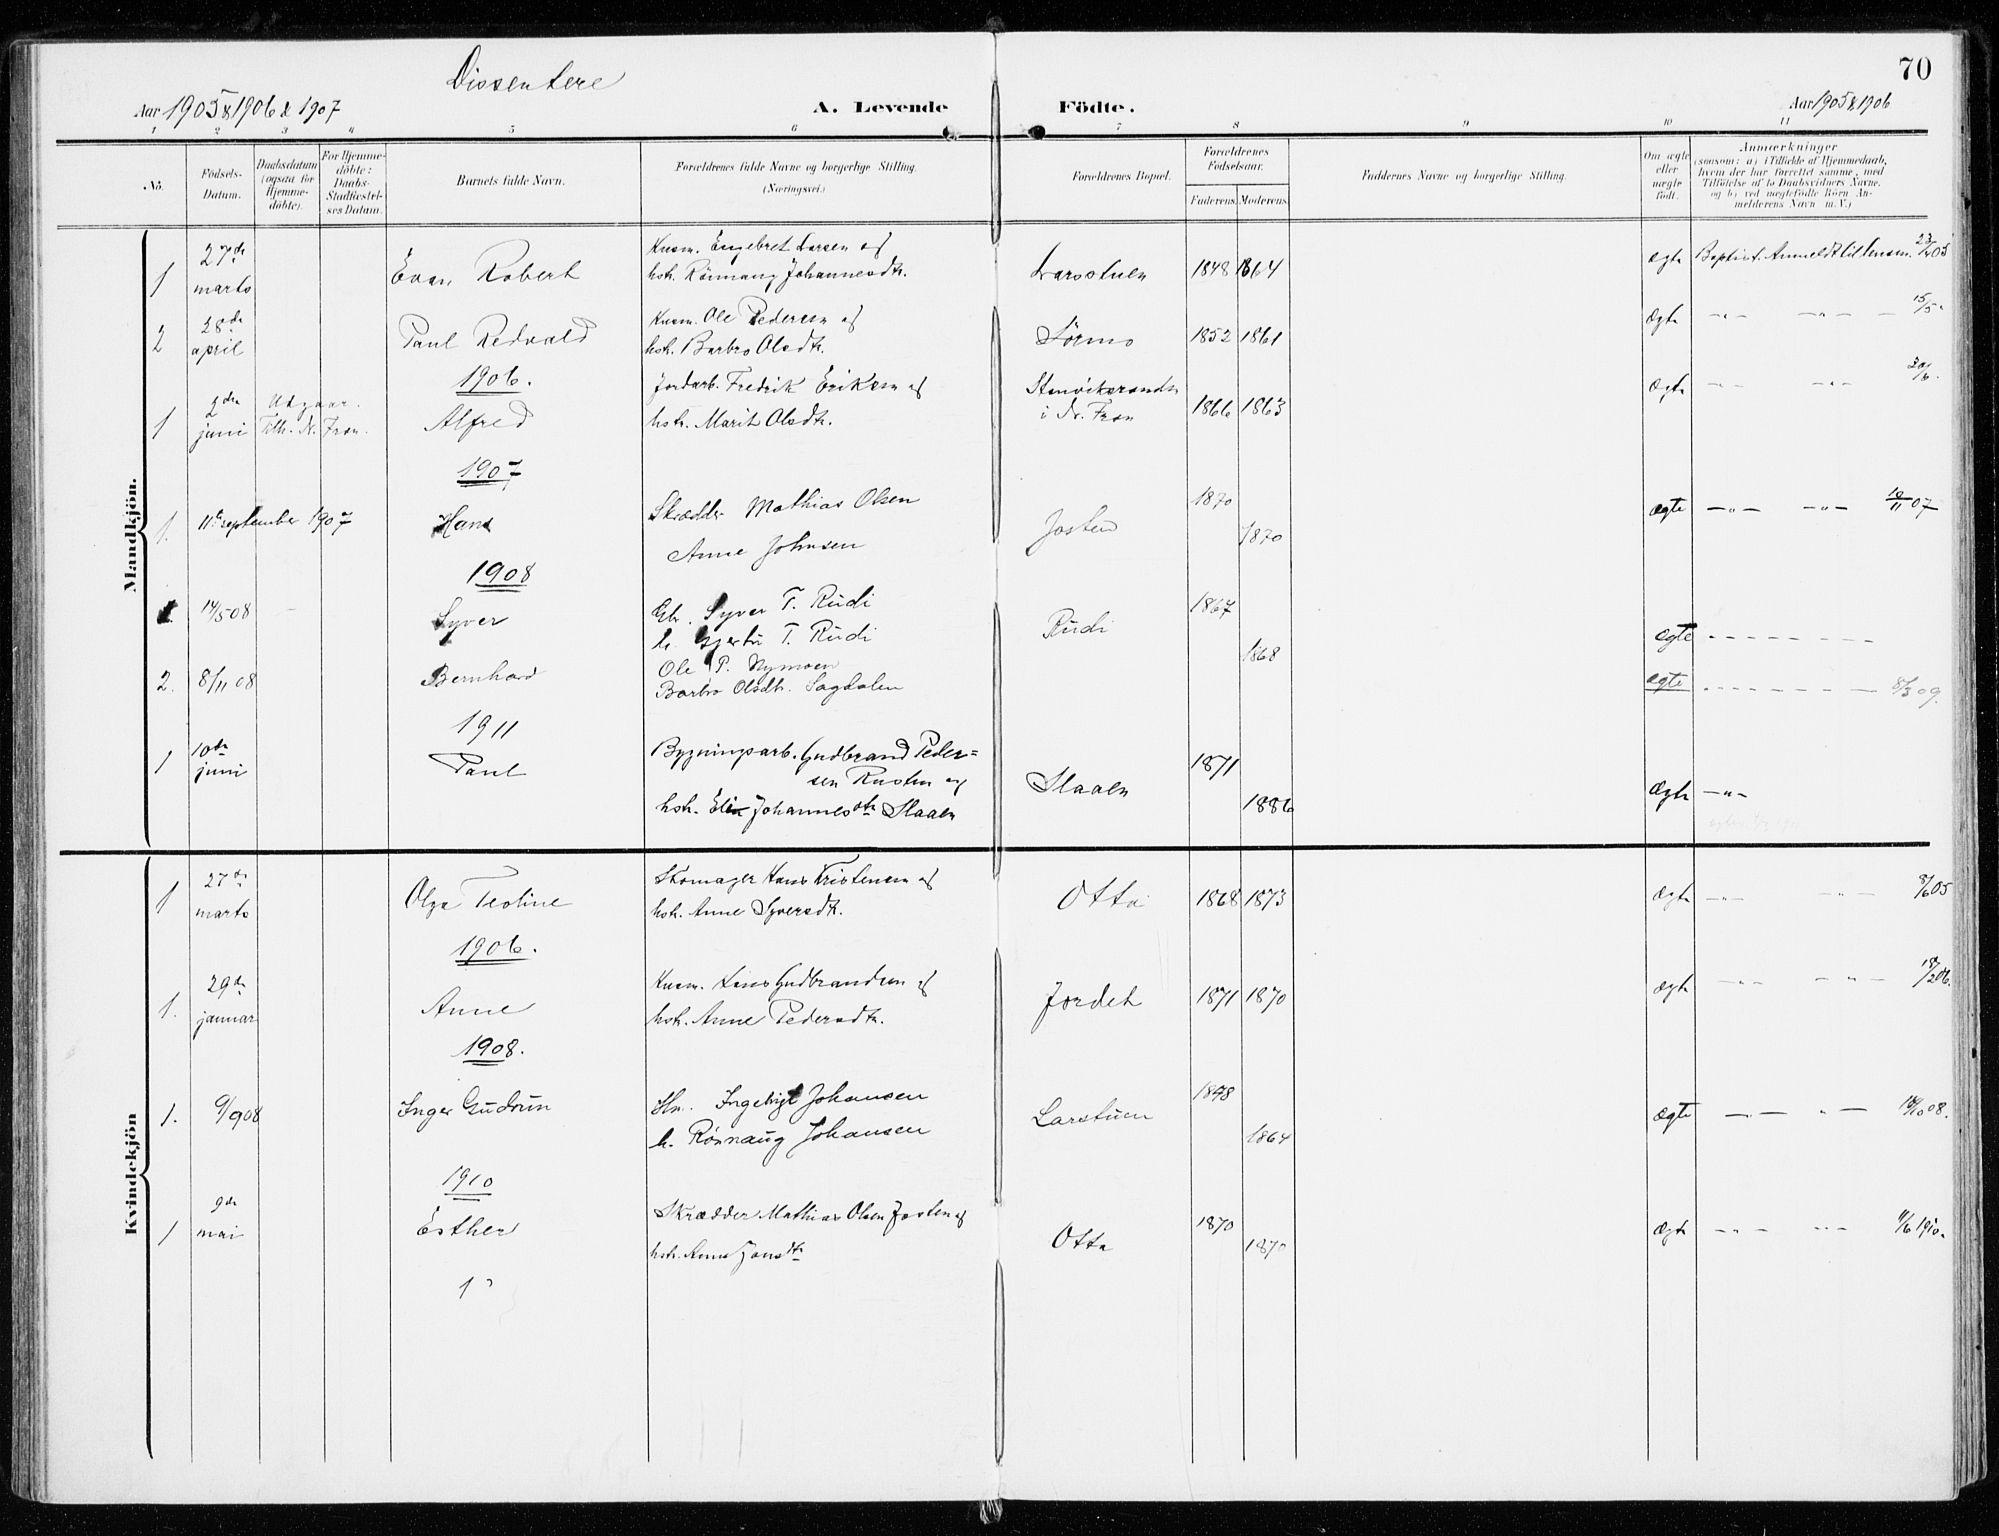 SAH, Sel prestekontor, Ministerialbok nr. 2, 1905-1919, s. 70